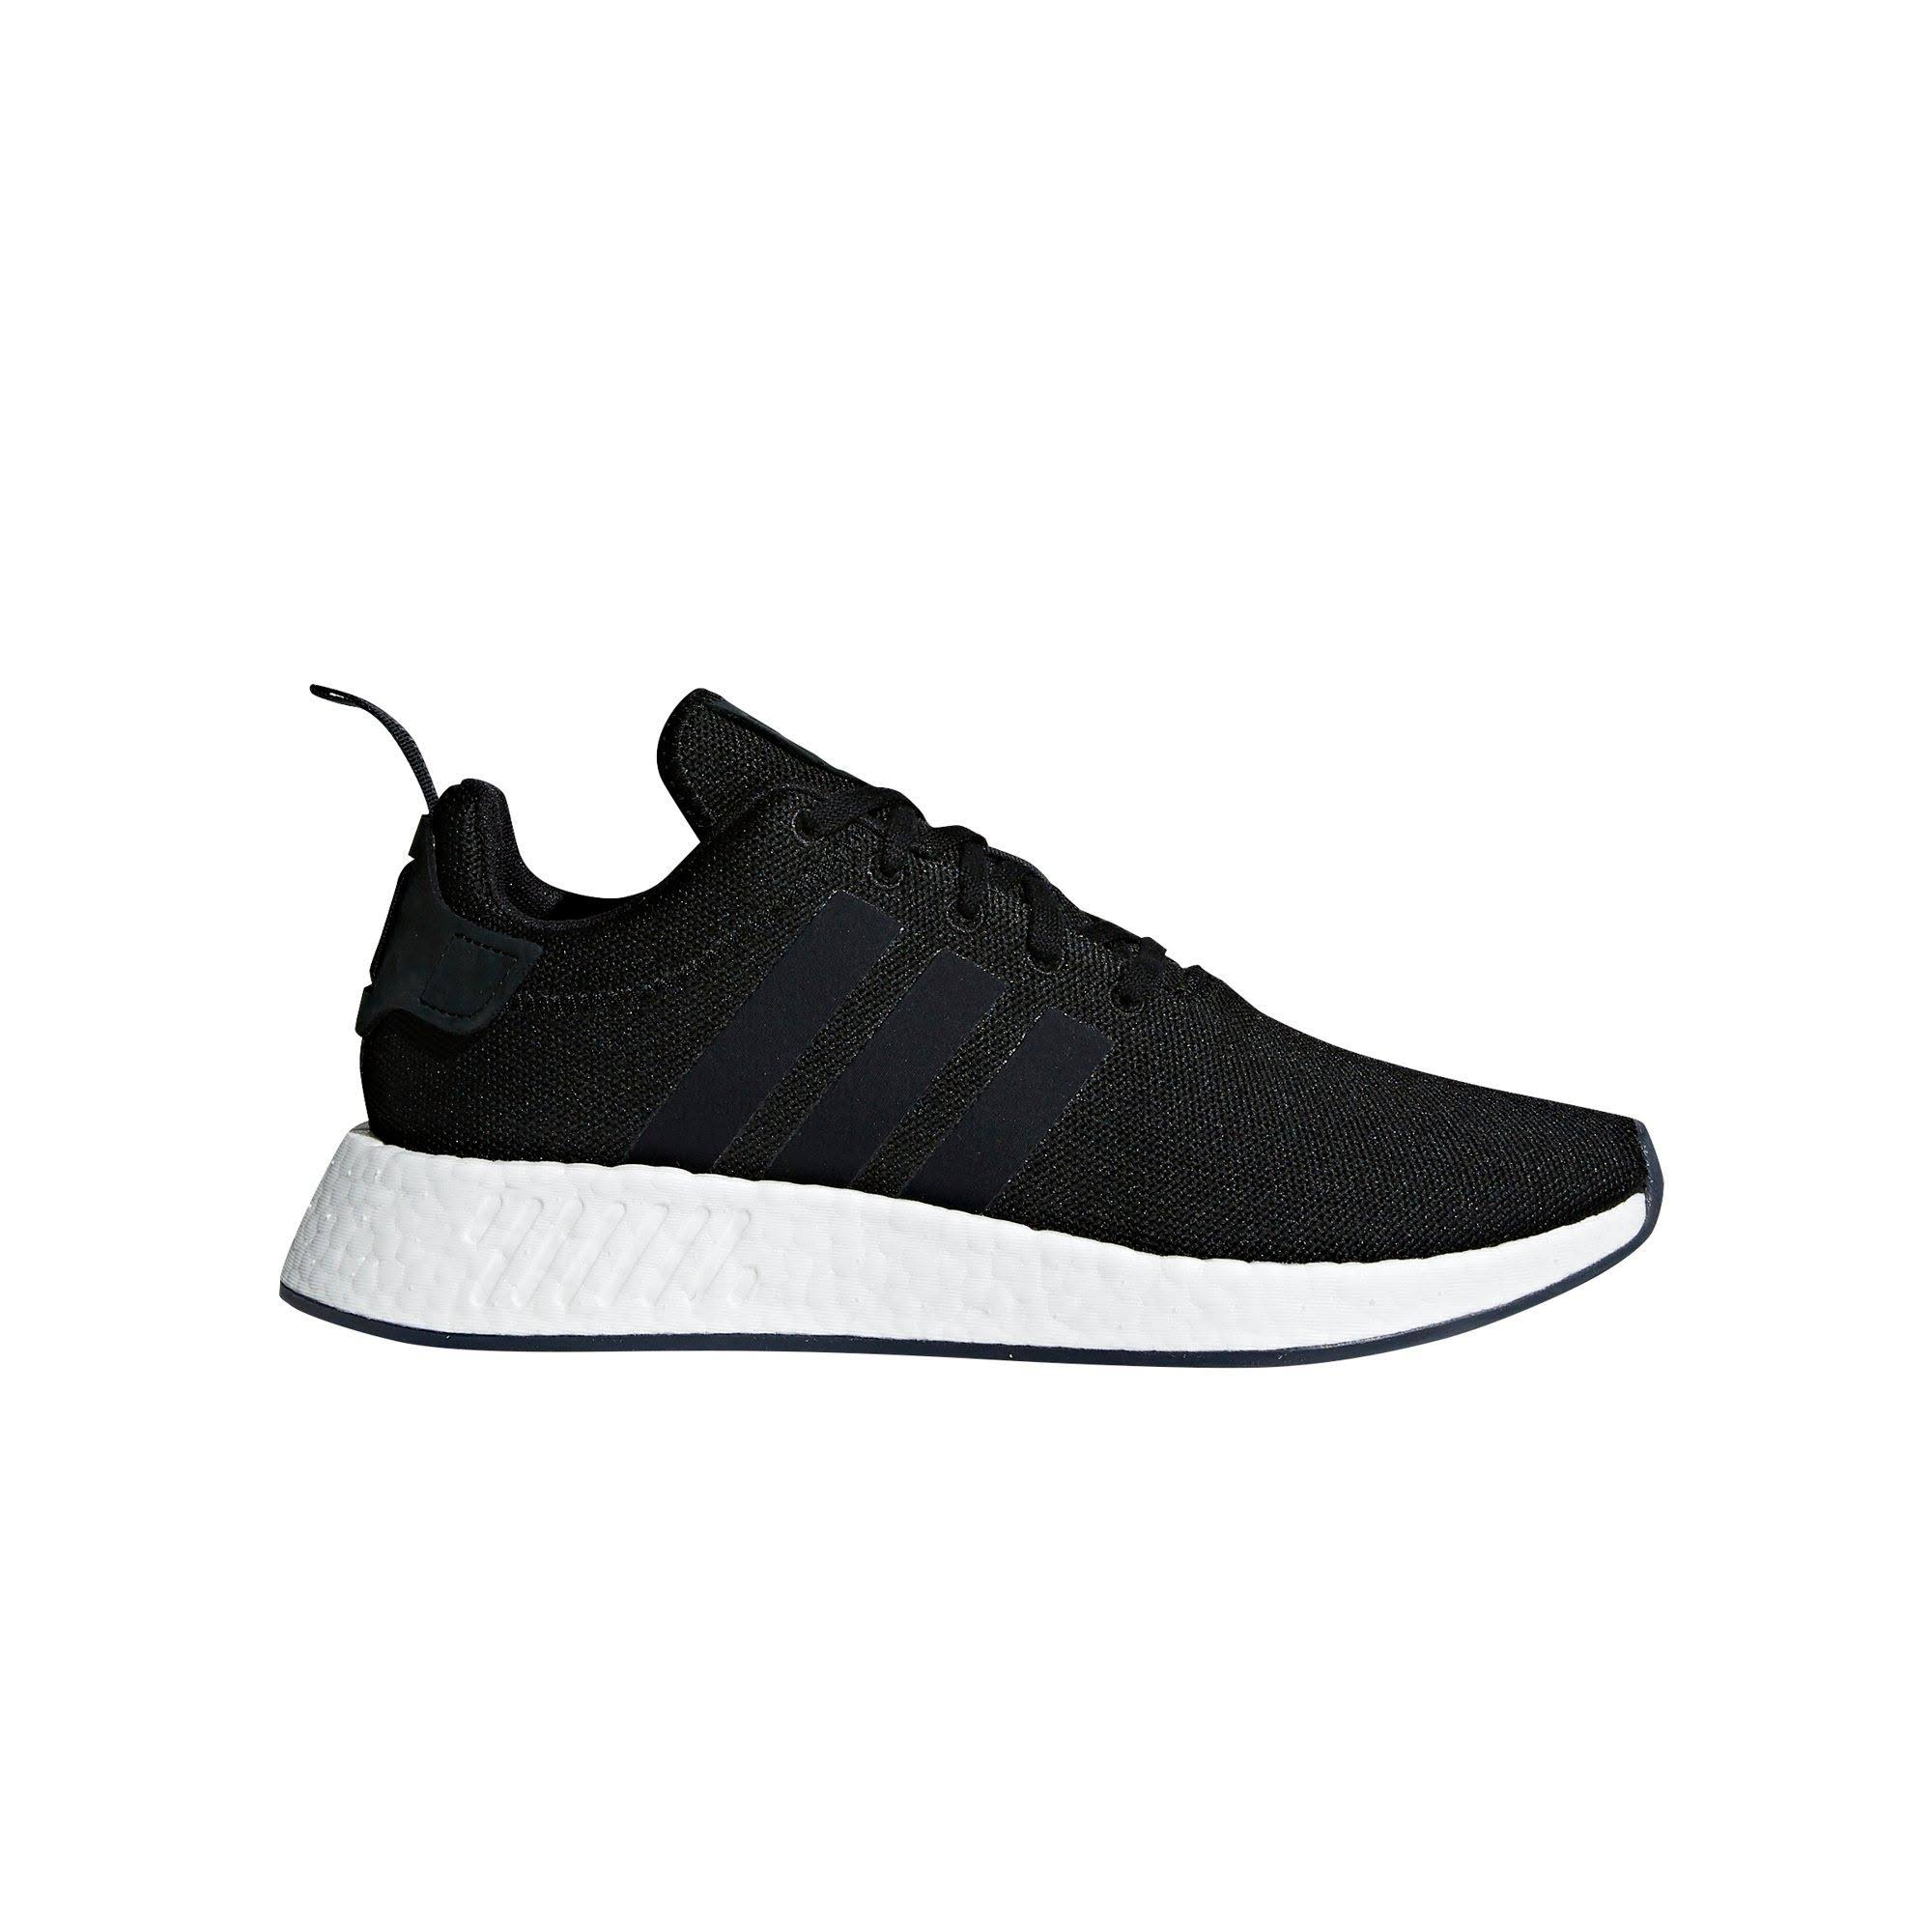 Black Nmd Originals Core Schuhe R2 Adidas 13 Mens zZwfSqq